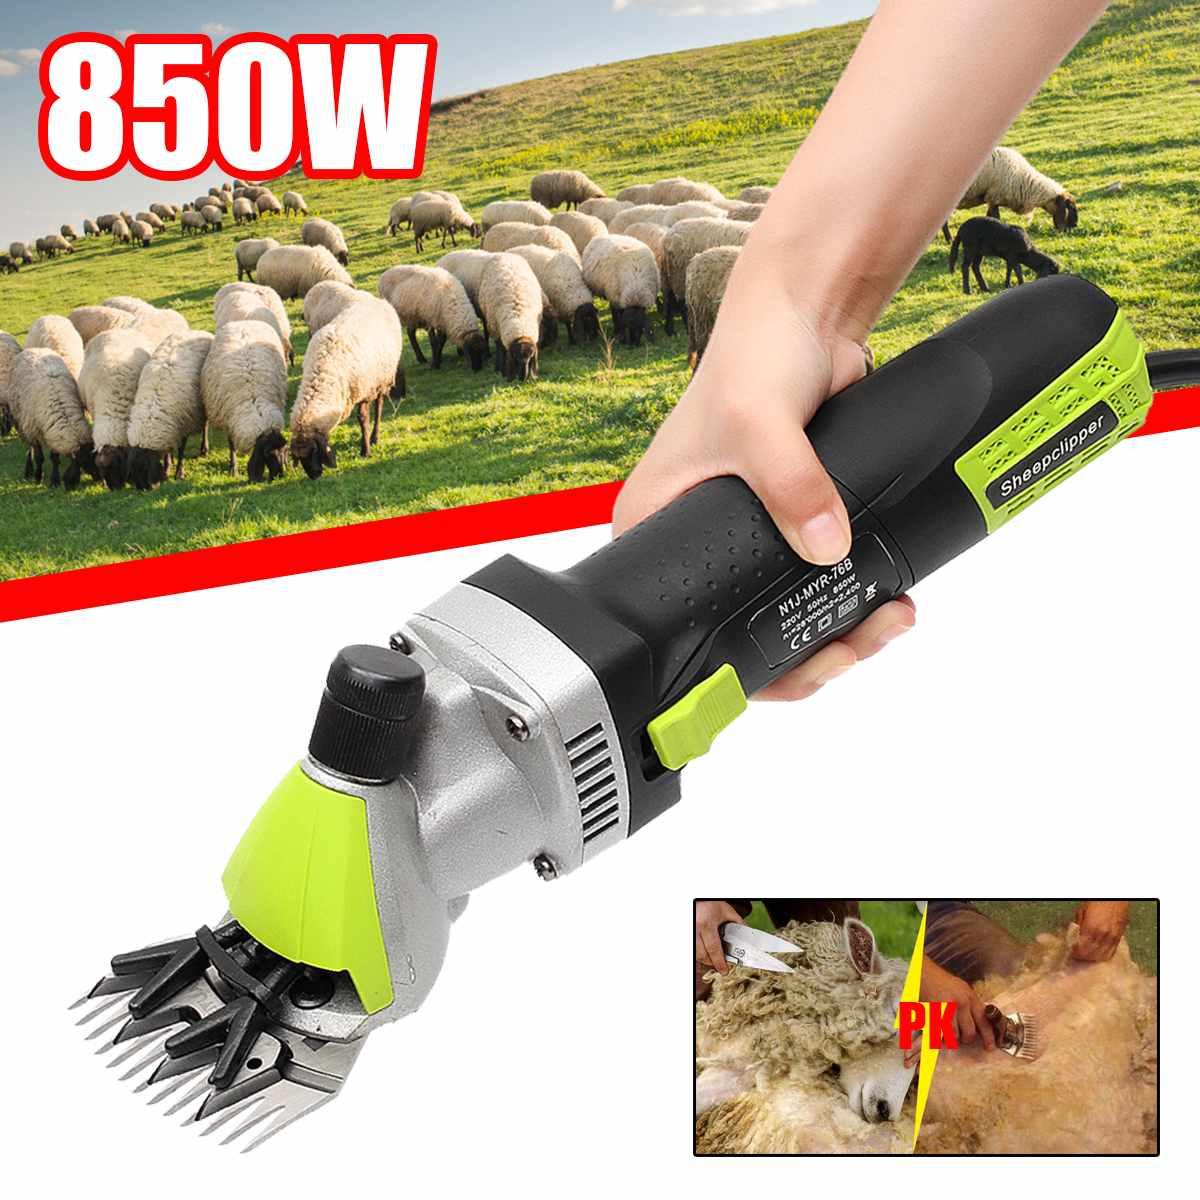 Electric Sheep Goats Shearing Clipper Animal Trimmer Tool Farm Pet Dog Hair Shearing Machine Cutter Wool Scissor 850W 220V - 1